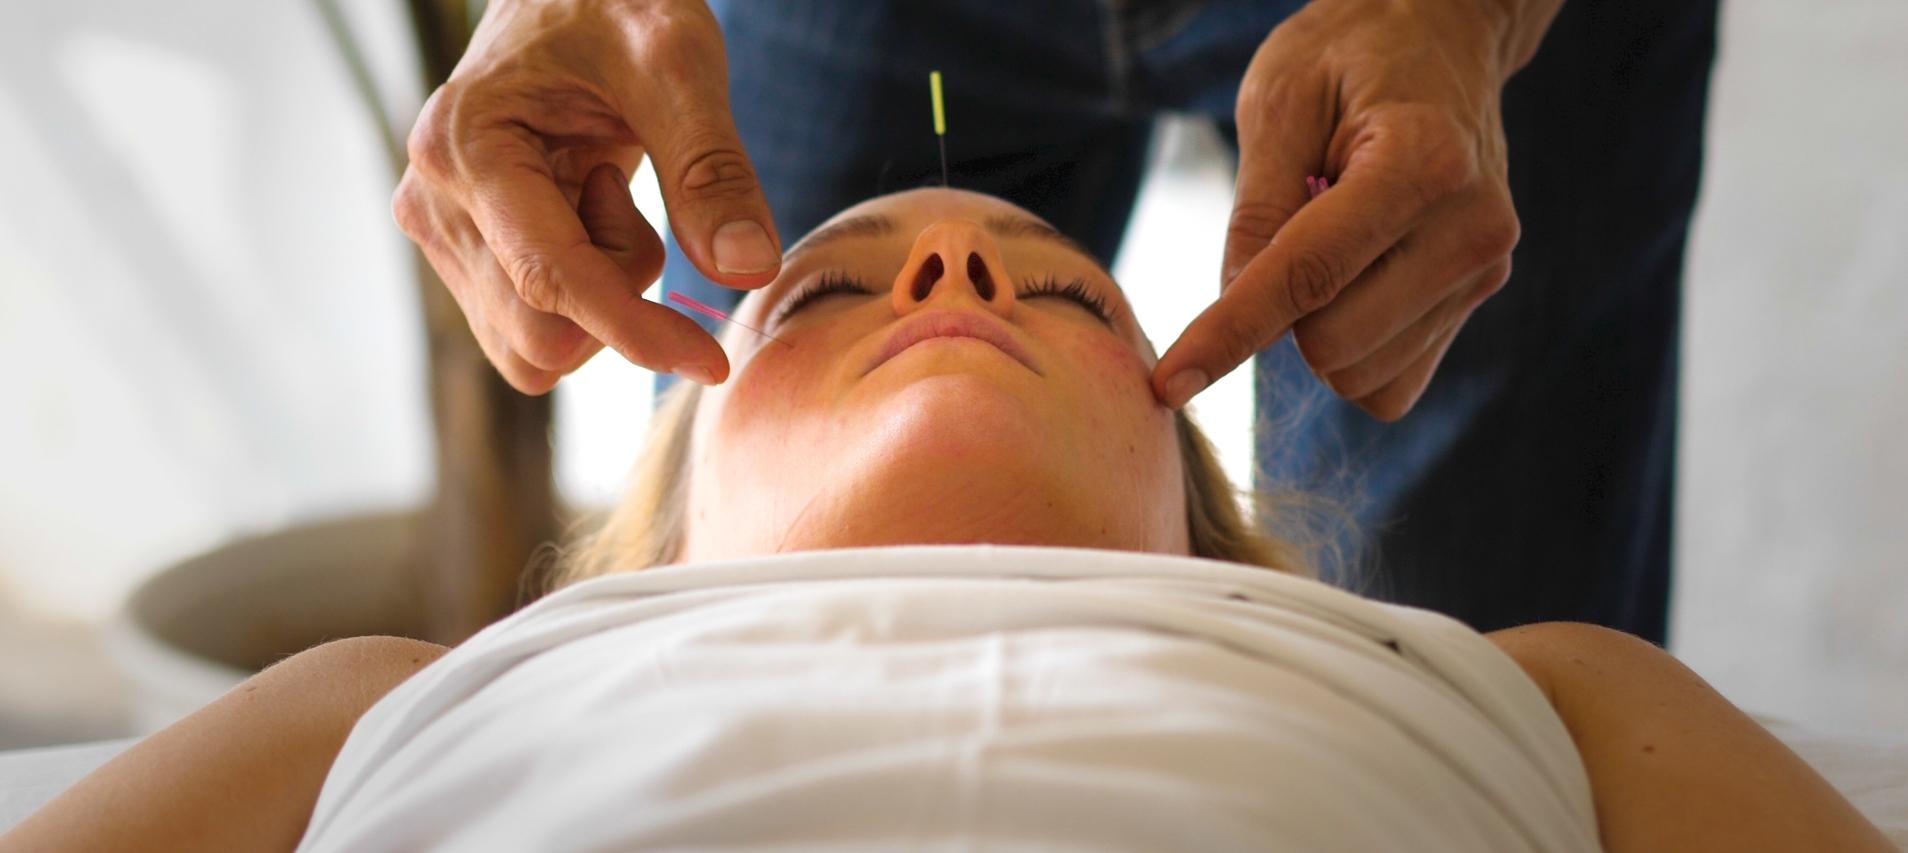 Acupuncture for Migraine_.jpg